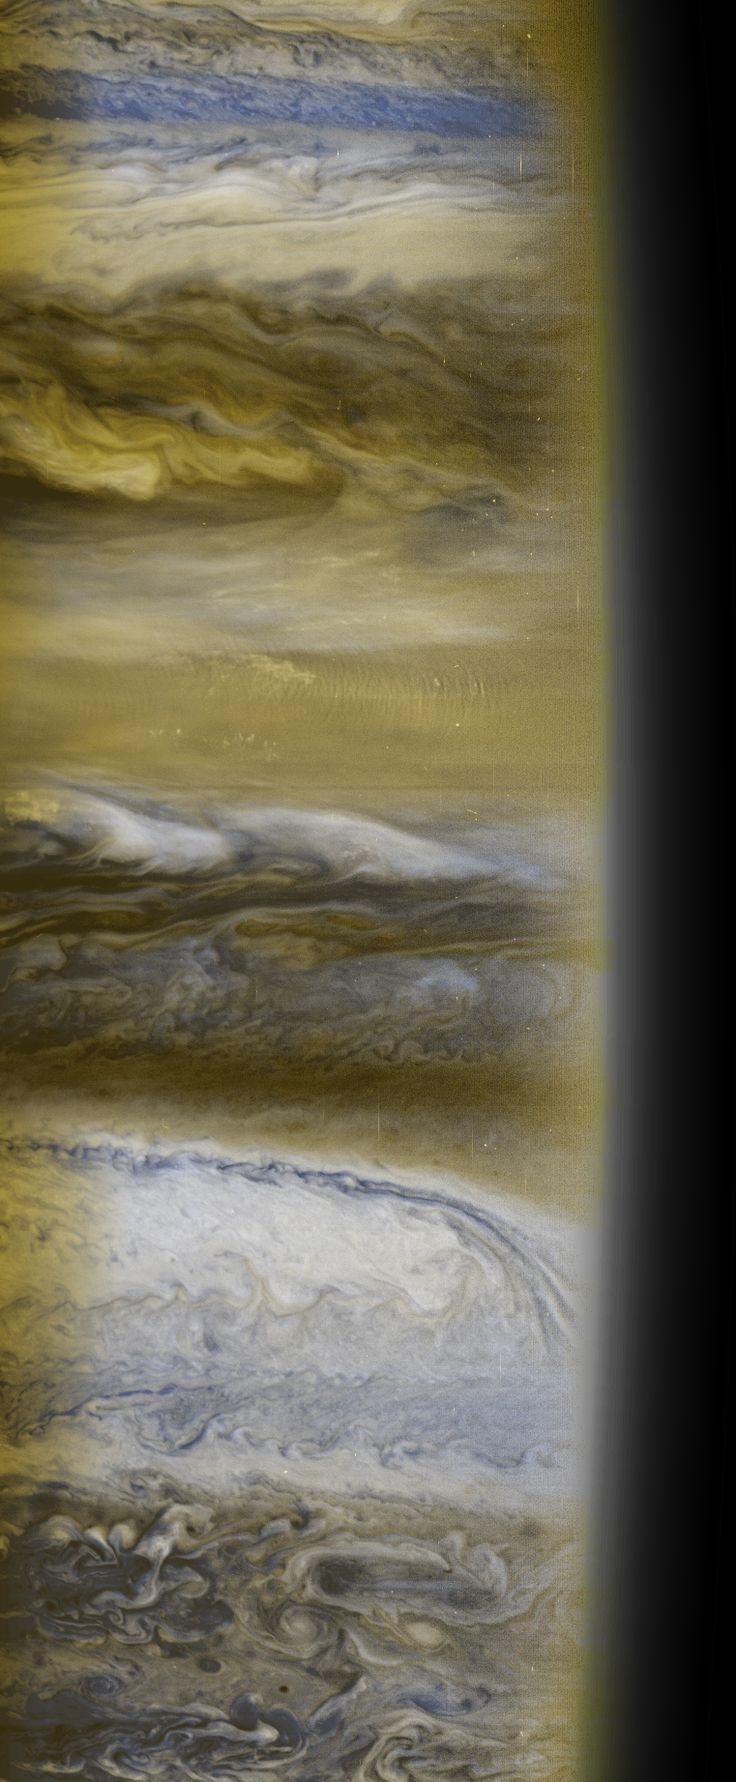 Atmospheric Structure (NASA New Horizons Jupiter Encounter Image)